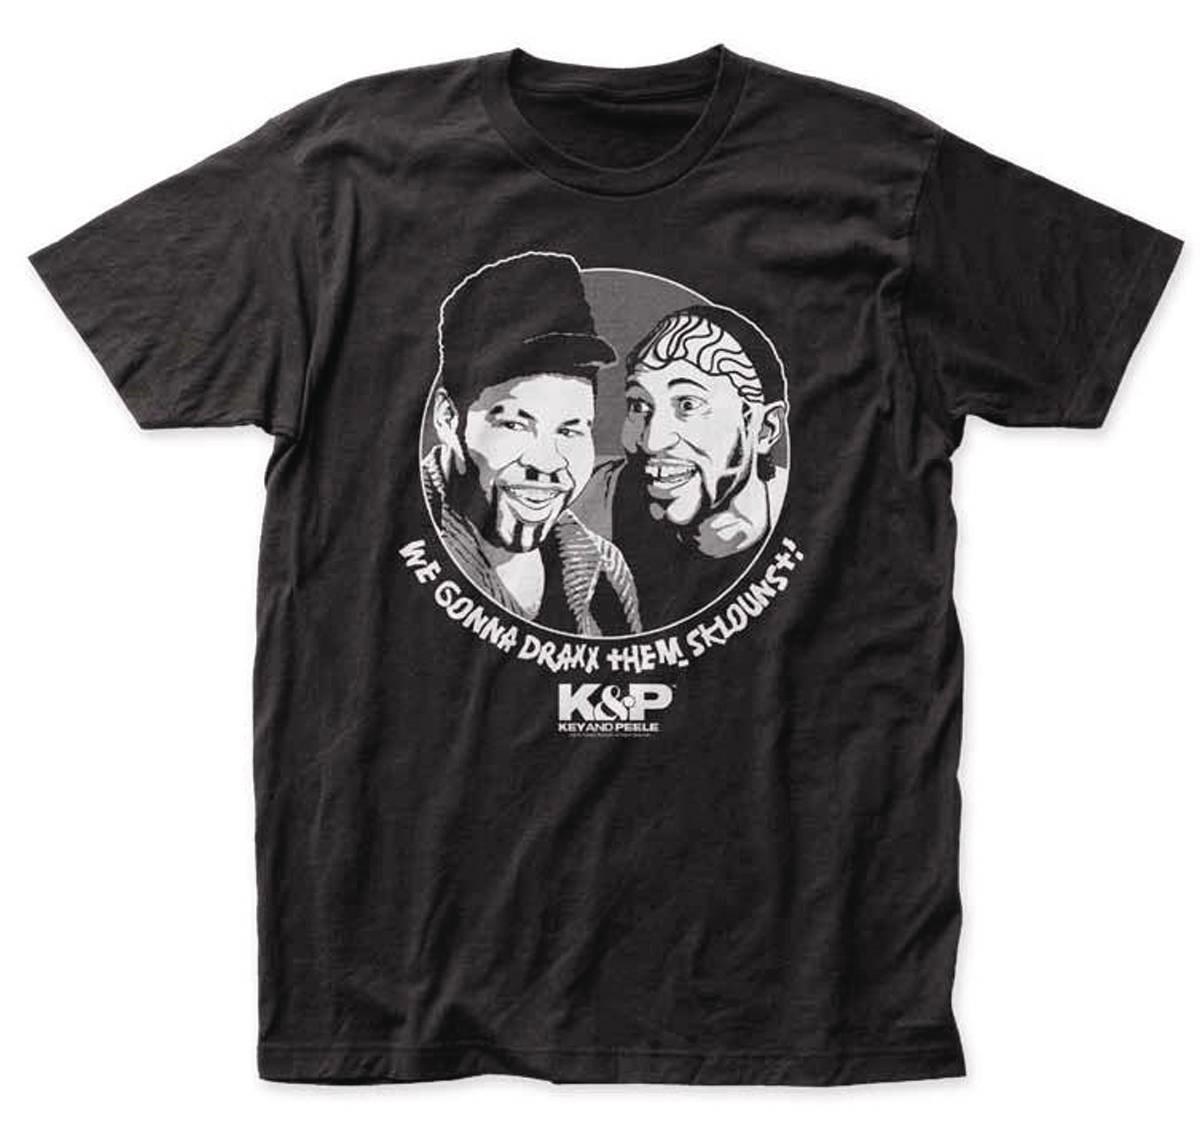 Key Peele Draxx Them Sklounst Shirt